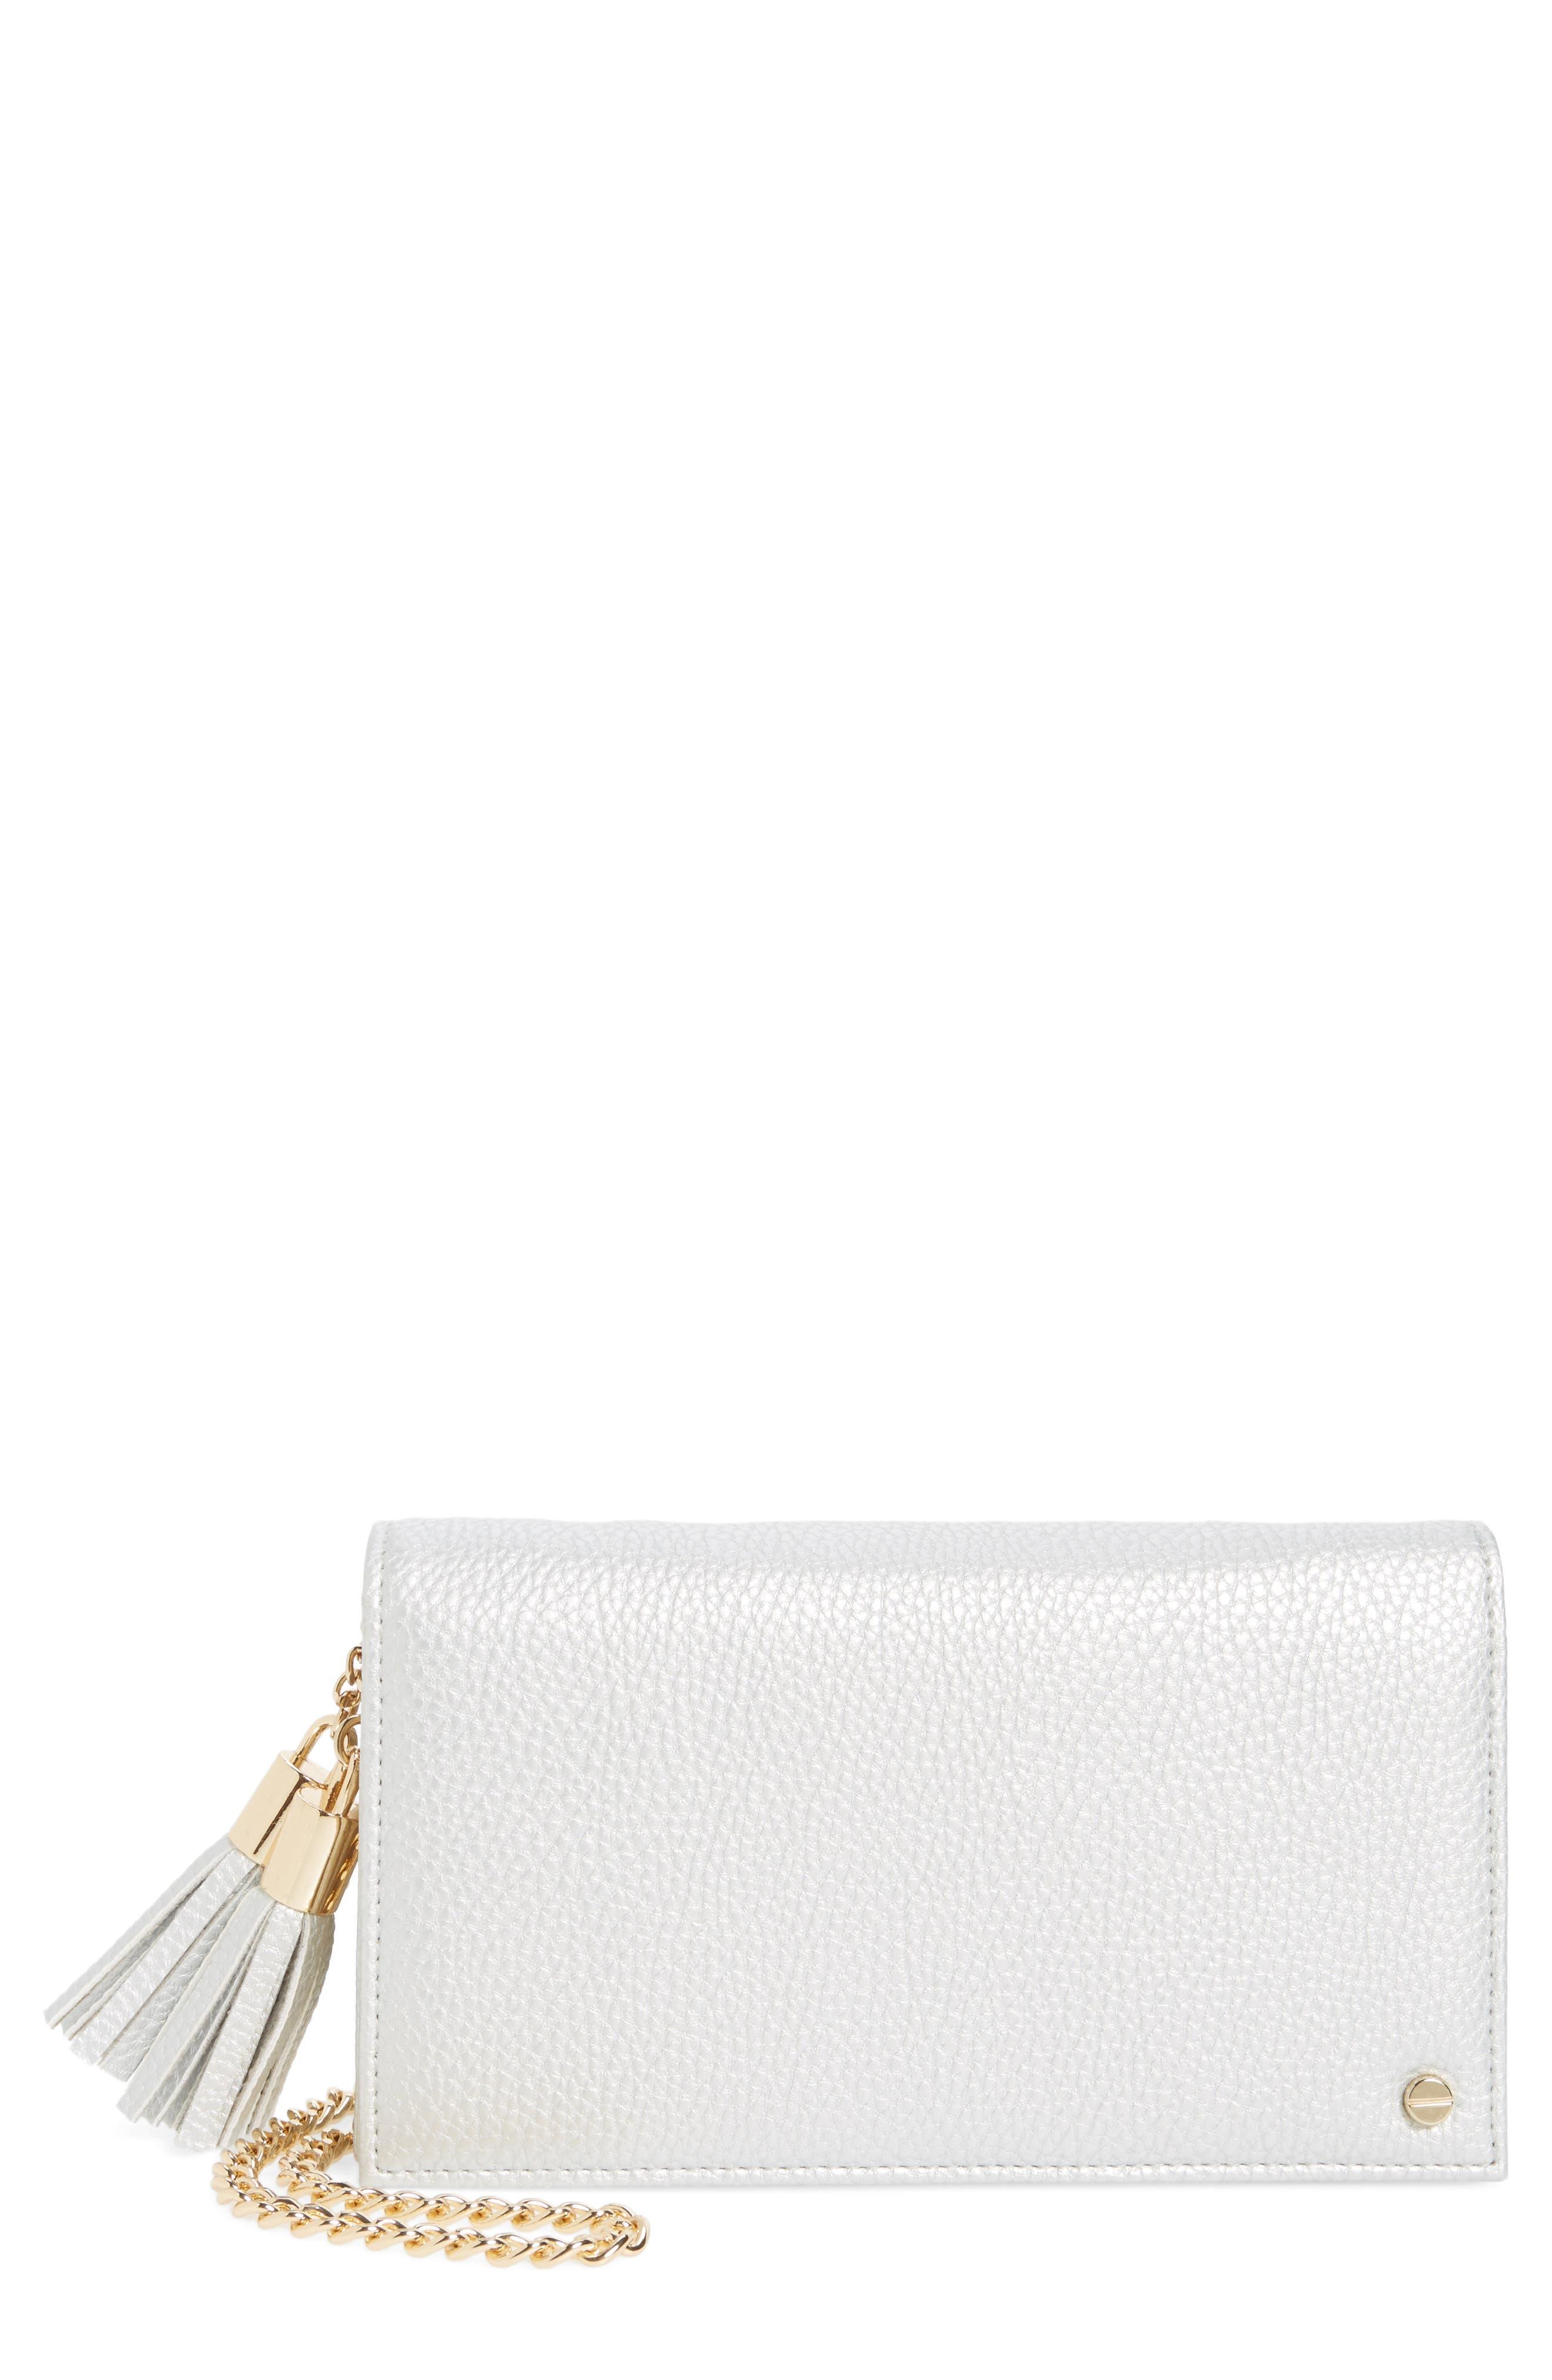 Mali + Lili Tassel Convertible Faux Leather Clutch